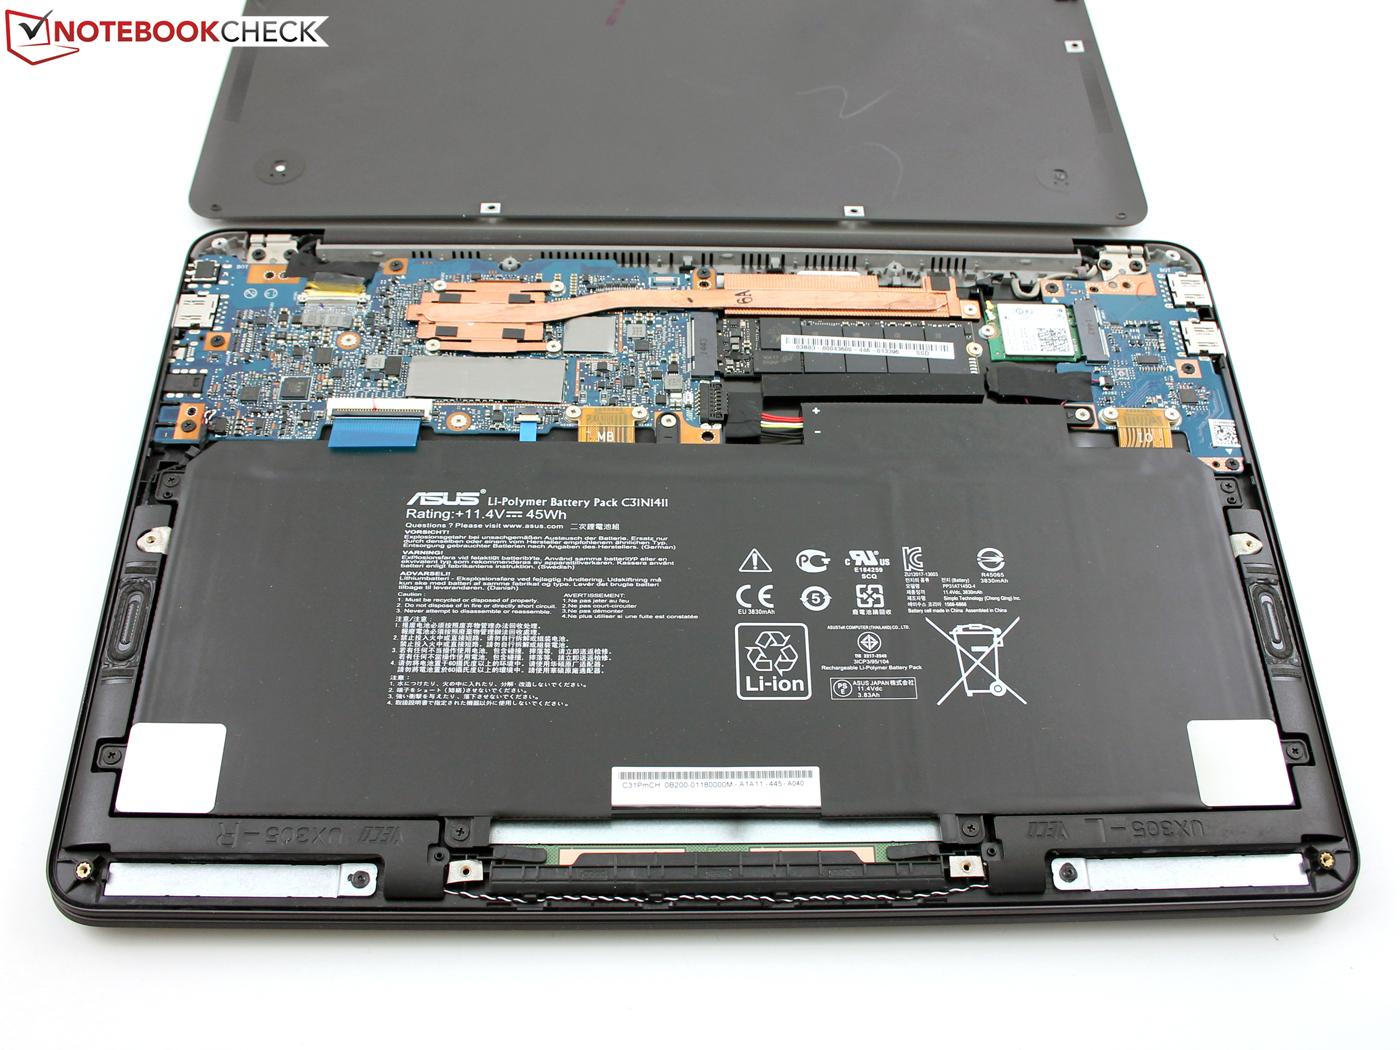 Asus Zenbook UX305CA-FB055T Subnotebook Review ...